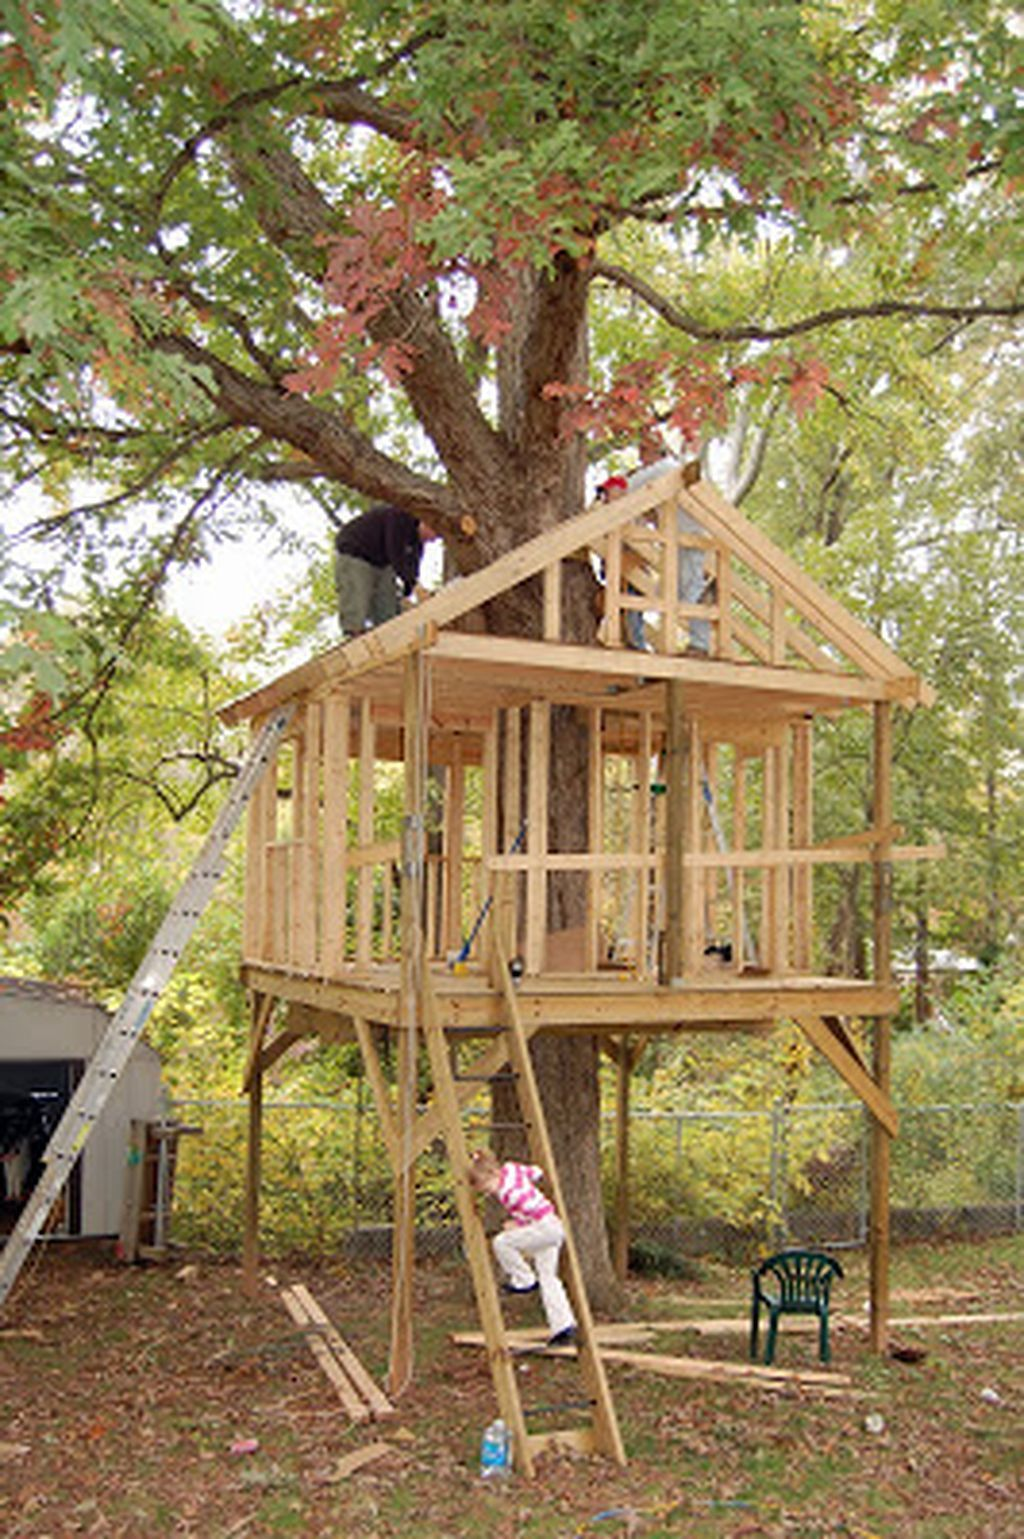 Gorgeous 167 Tree House Design Ideas Your Kids Would Love Tree House Diy Tree House Kids Tree House Small backyard treehouse ideas